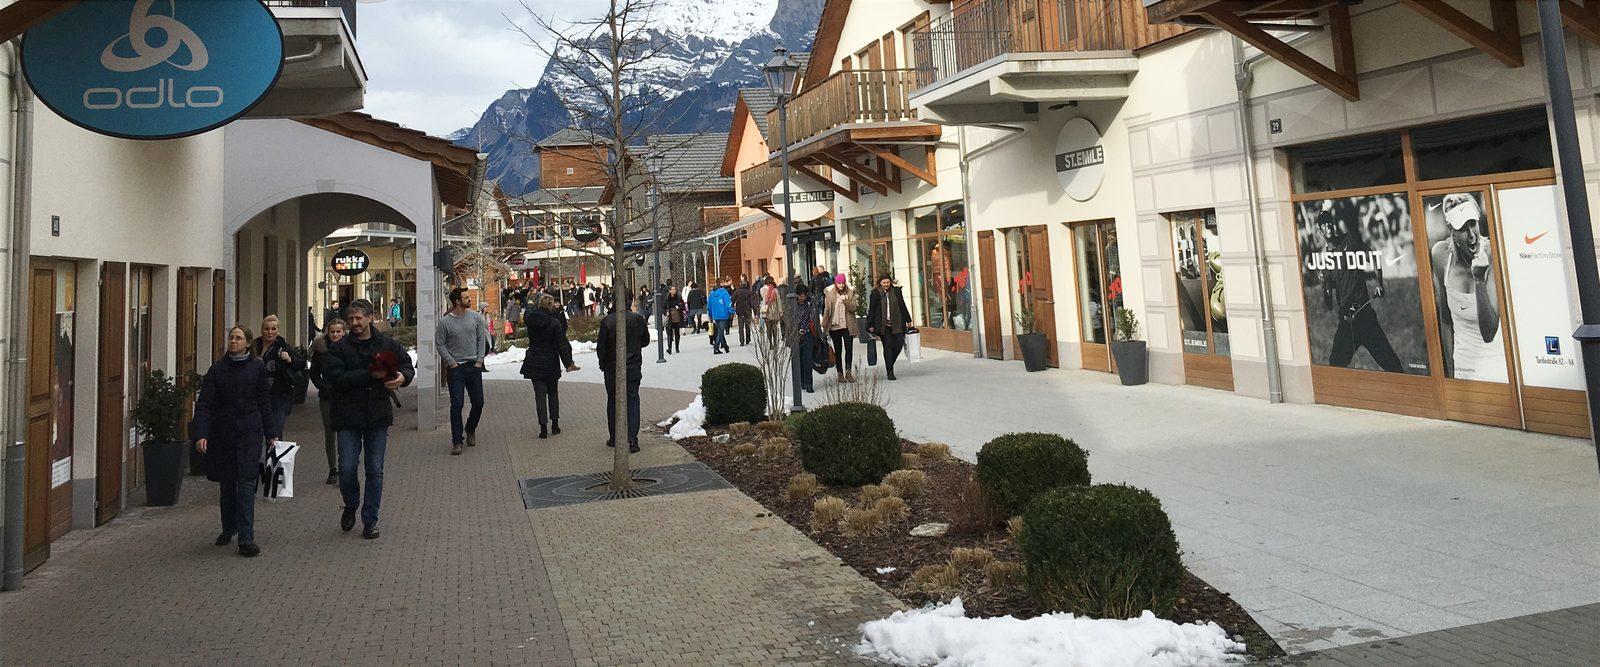 Shopping Resort Walensee Switzerland